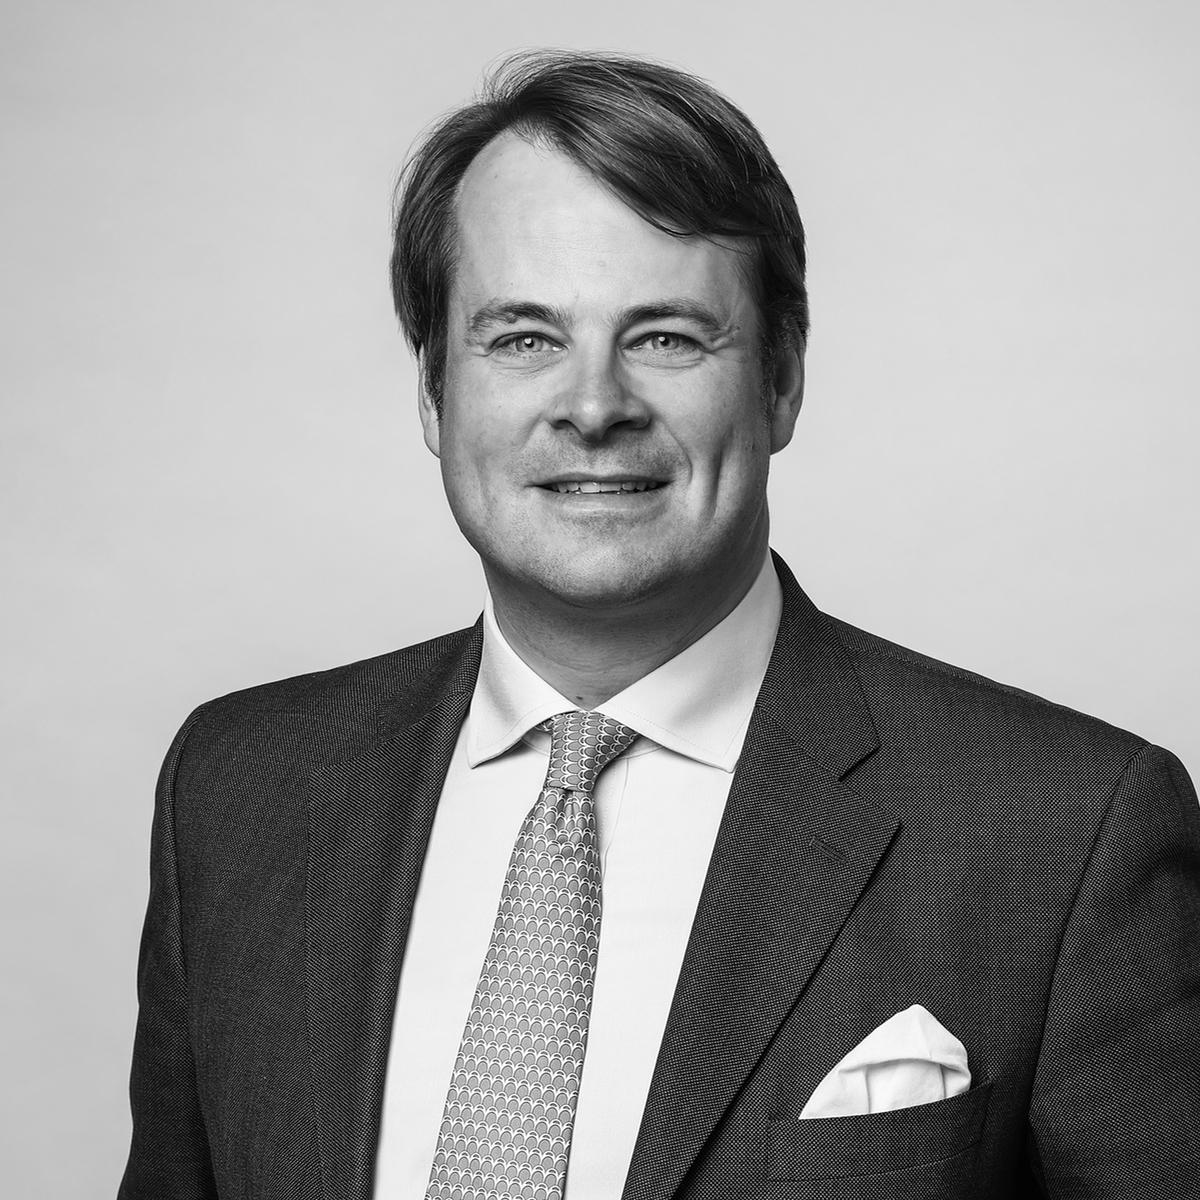 Friedrich Baur - ….ist seit 2014 bei der J.F. Müller & Sohn AG, seit 2016 im Vorstand. Davor war er in operativen Führungspositionen für das Hongkong-Chinesische Maschinenbauunternehmen CHTC Fong's Industries tätig...has been with J.F. Müller & SohnAG since 2014, as amember of the Management Board since 2016. Prior to that, he held executive positions at Hong Kong-based Chinese engineering firm CHTC Fong's Industries.….